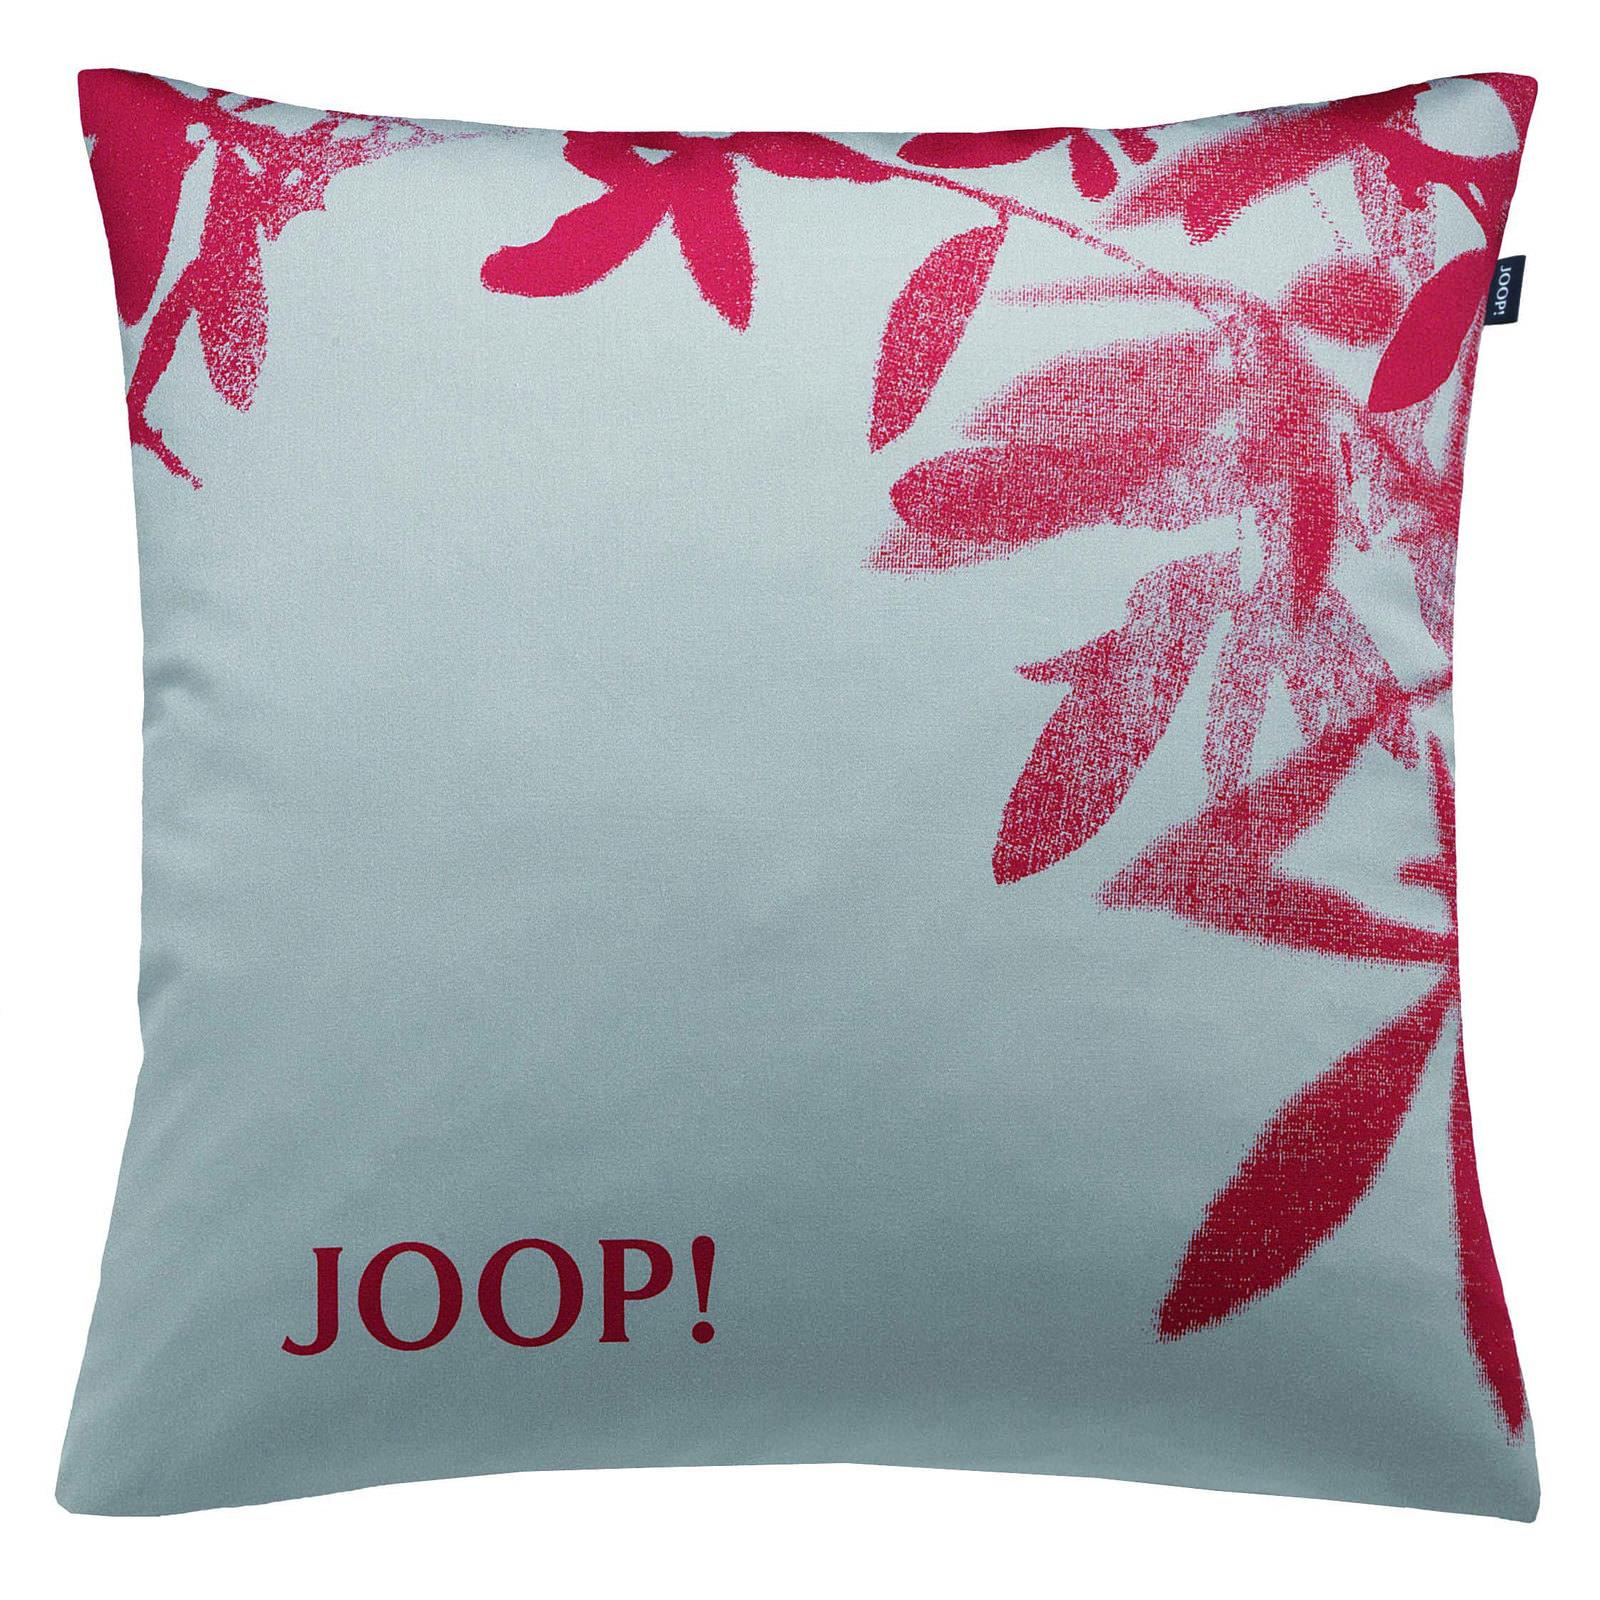 joop joop kissenh lle grau rot online entdecken schaffrath ihr m belhaus. Black Bedroom Furniture Sets. Home Design Ideas